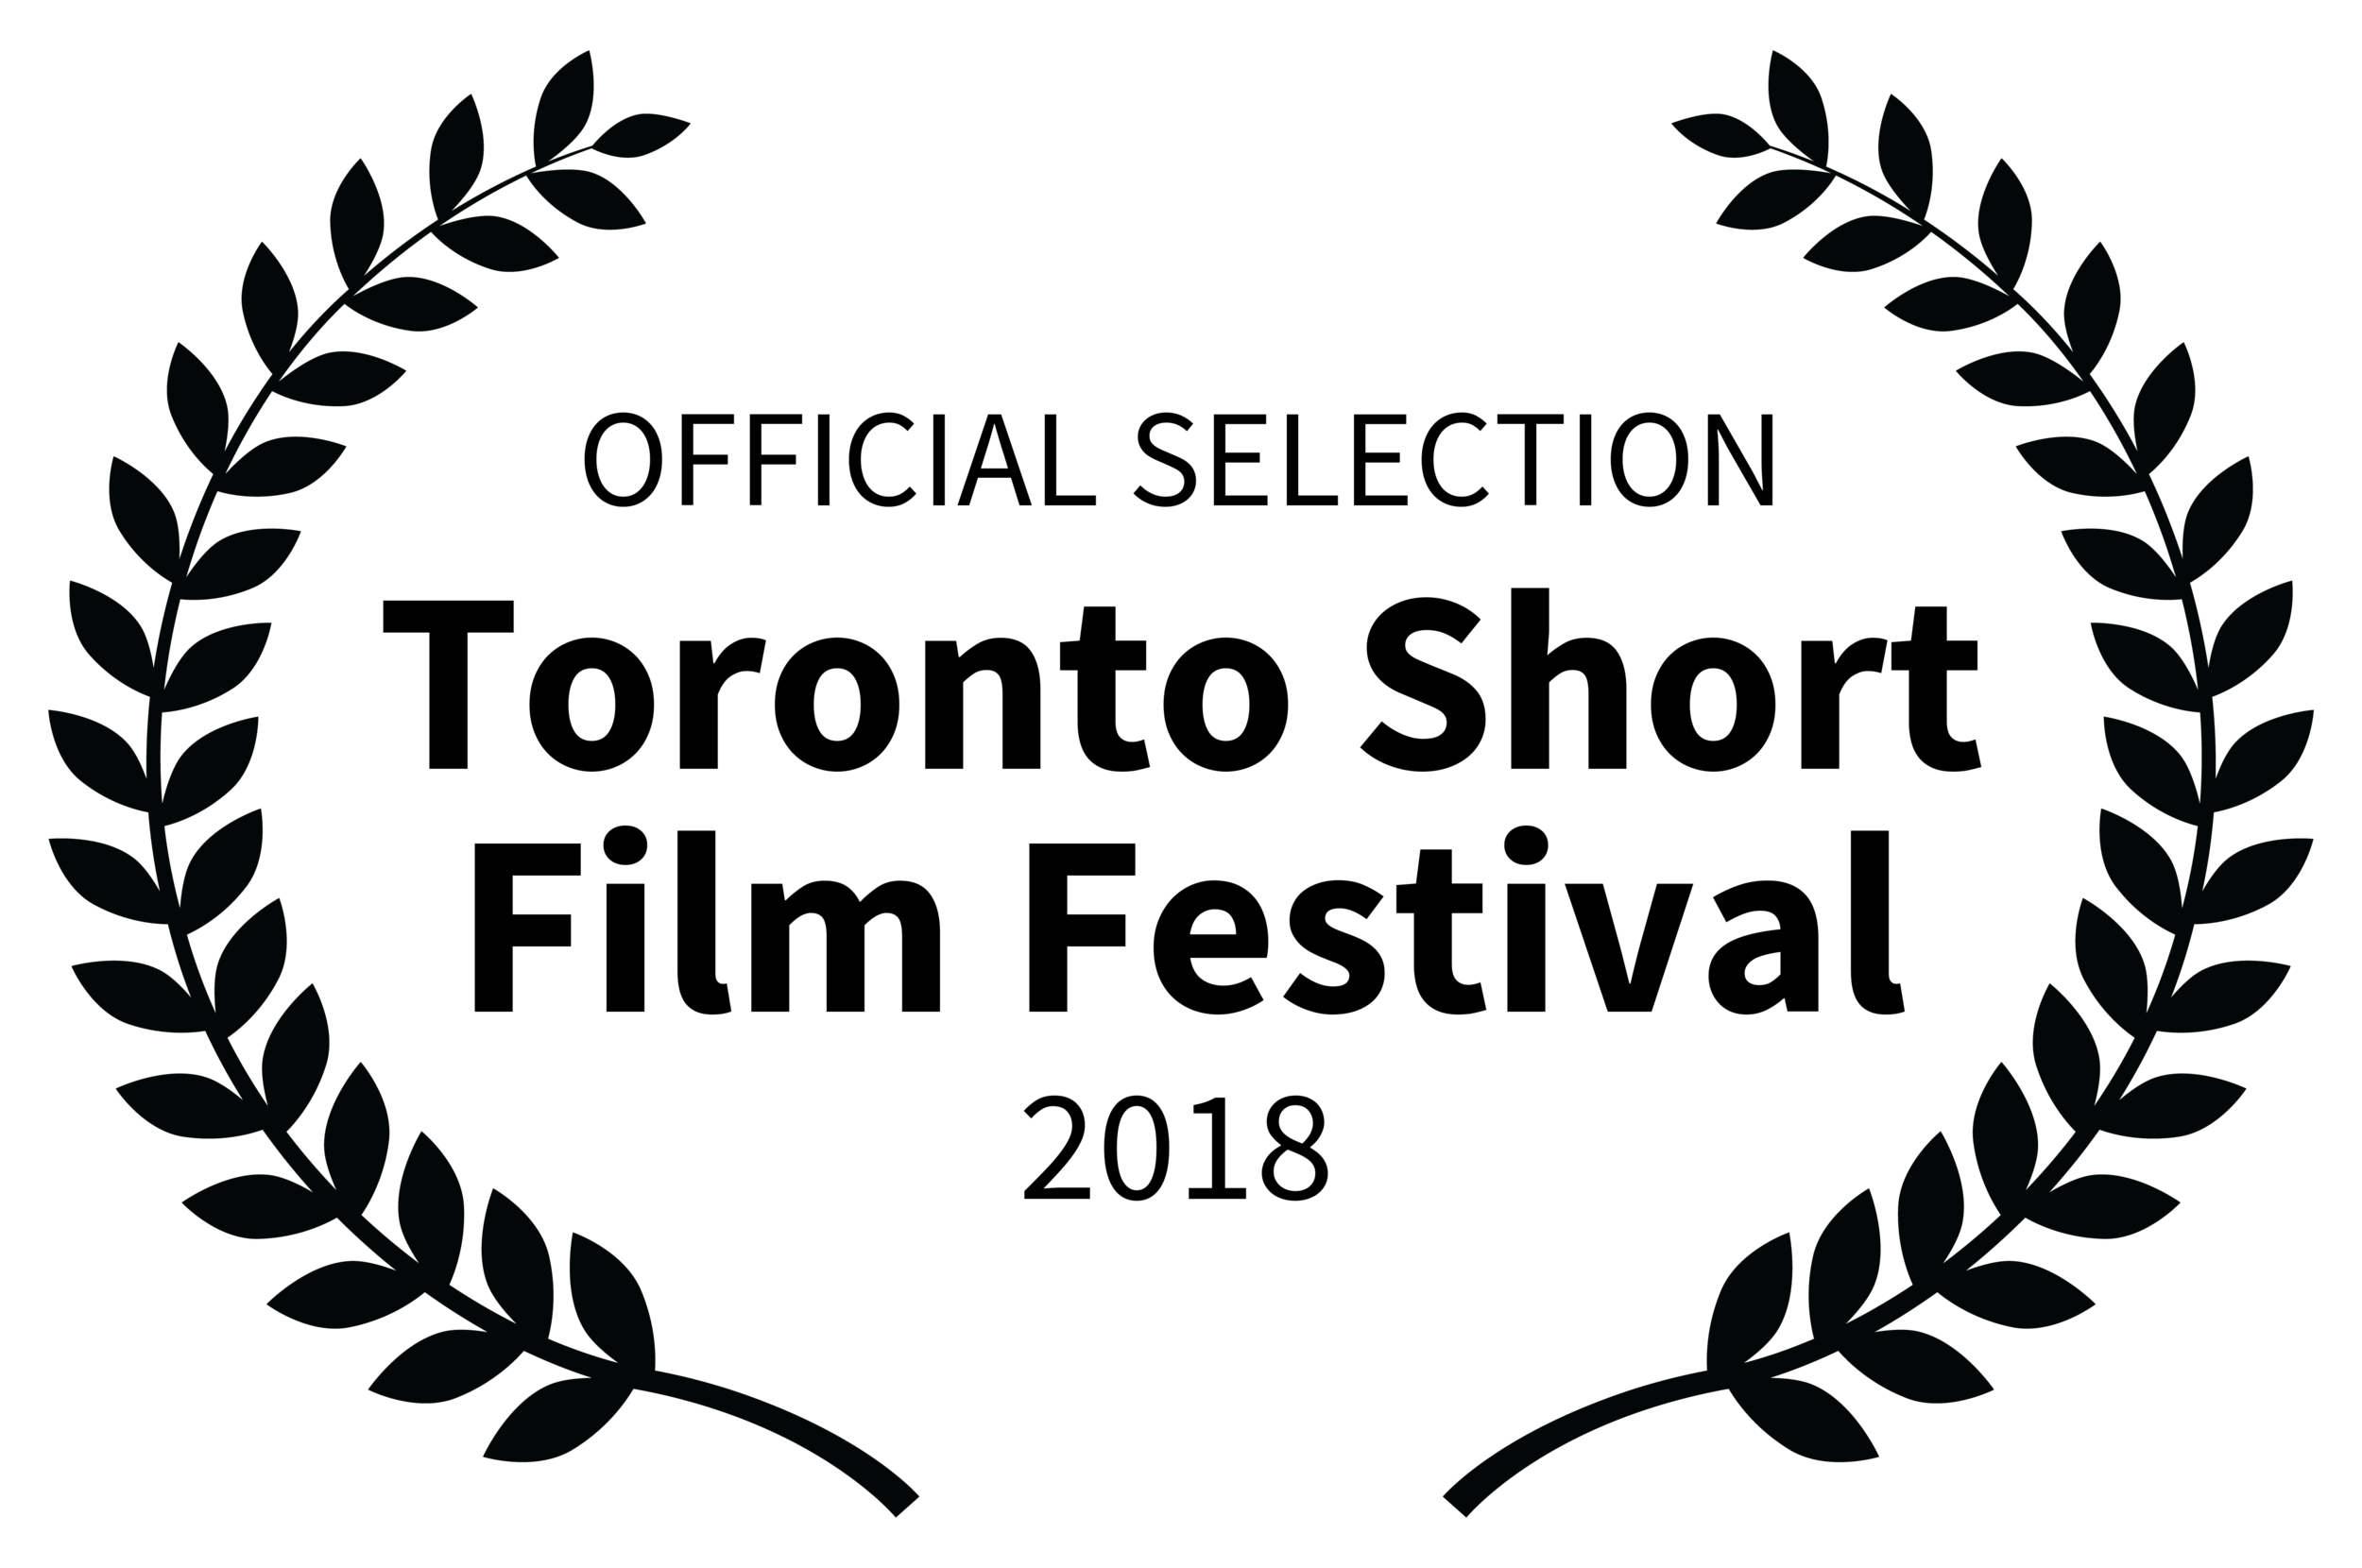 OFFICIALSELECTION-TorontoShortFilmFestival-2018.png